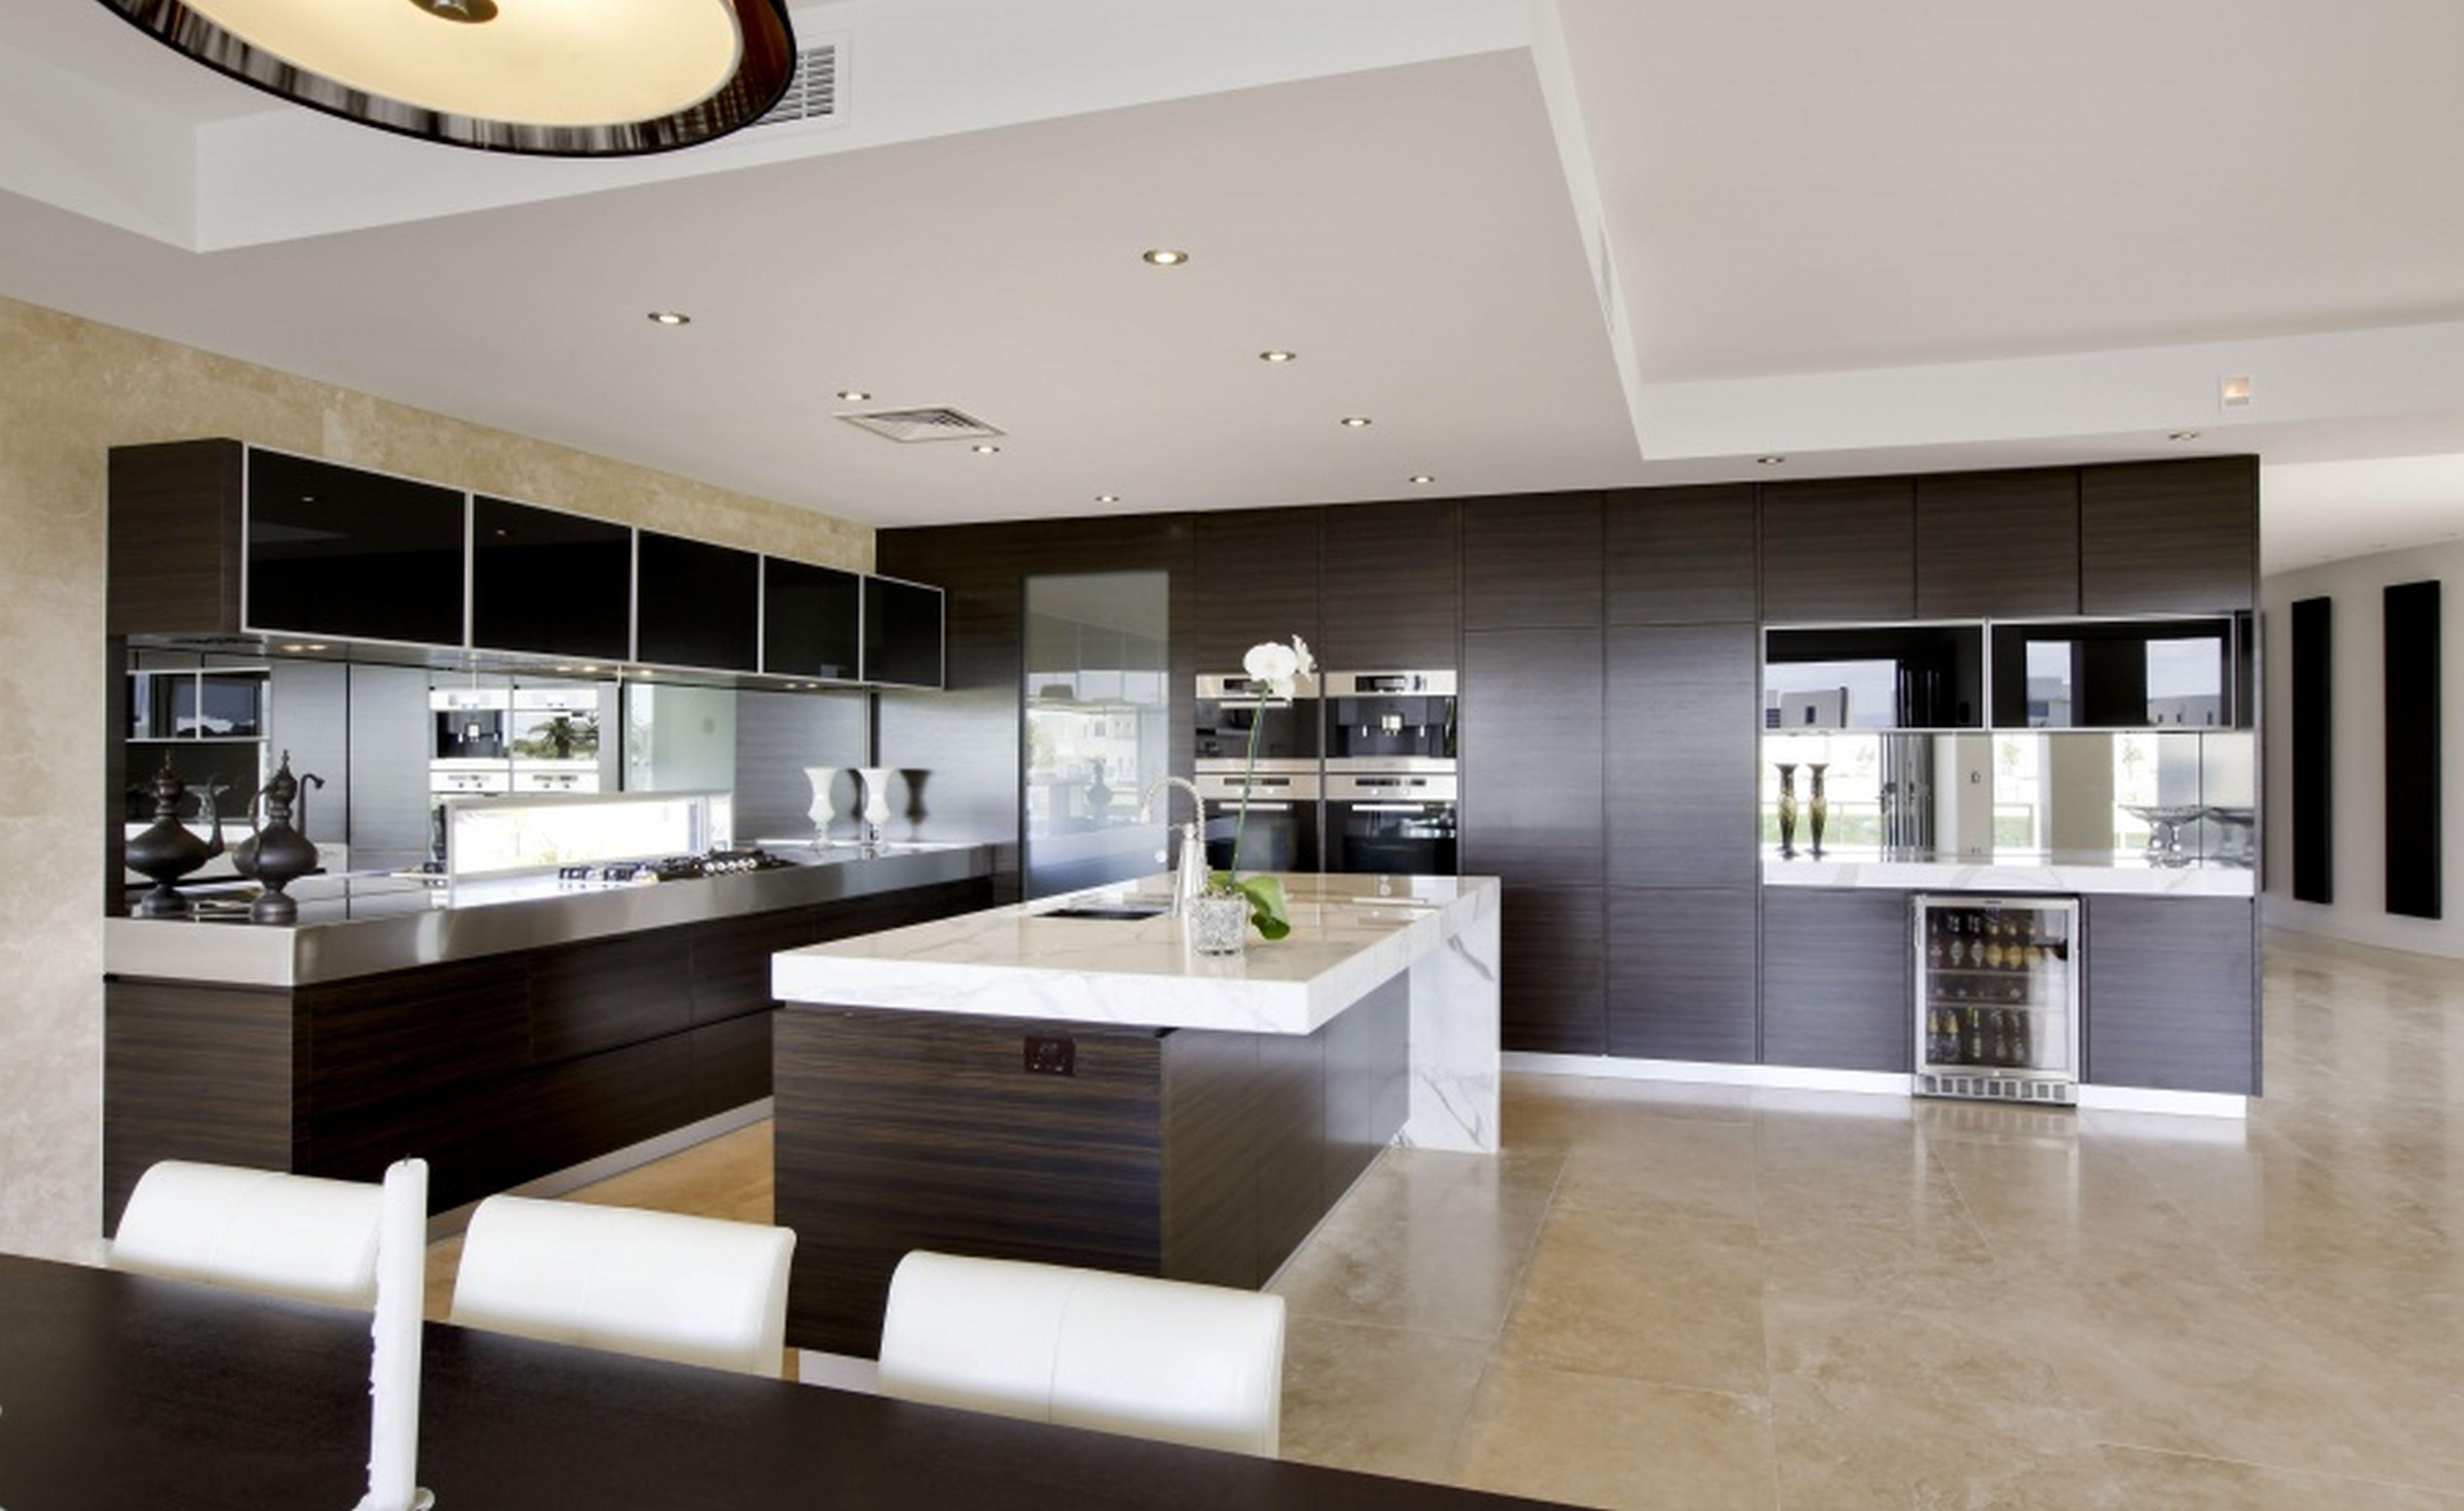 modern mad home interior design ideas beautiful kitchen ideas contemporary kitchen design on e kitchen ideas id=72111